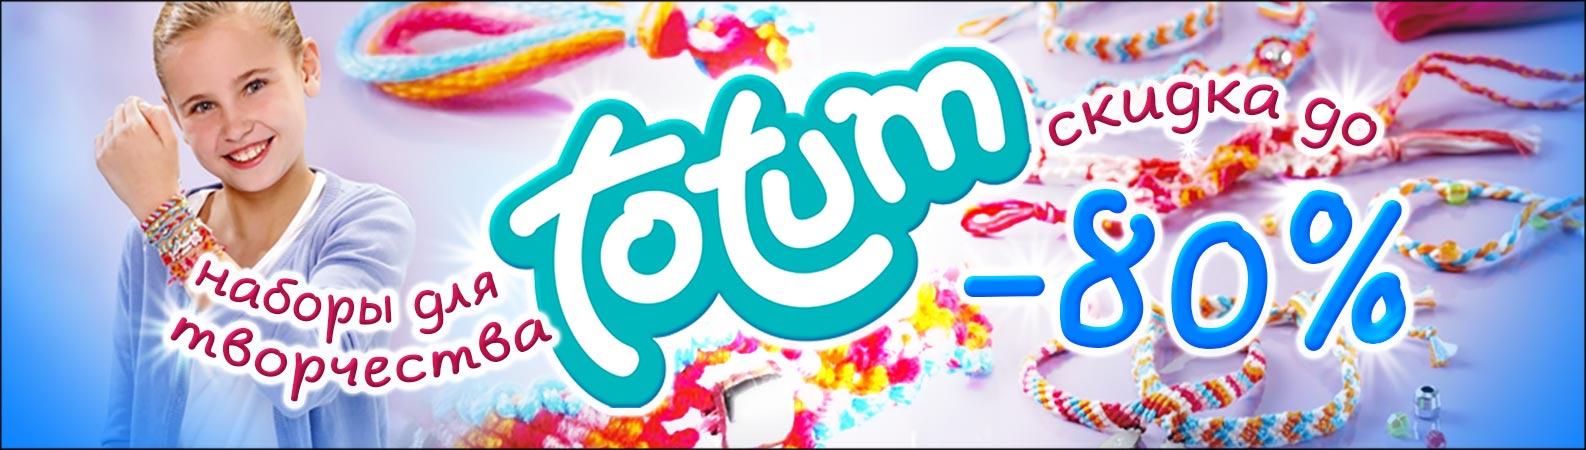 Акция -80% на наборы для творчества Totum